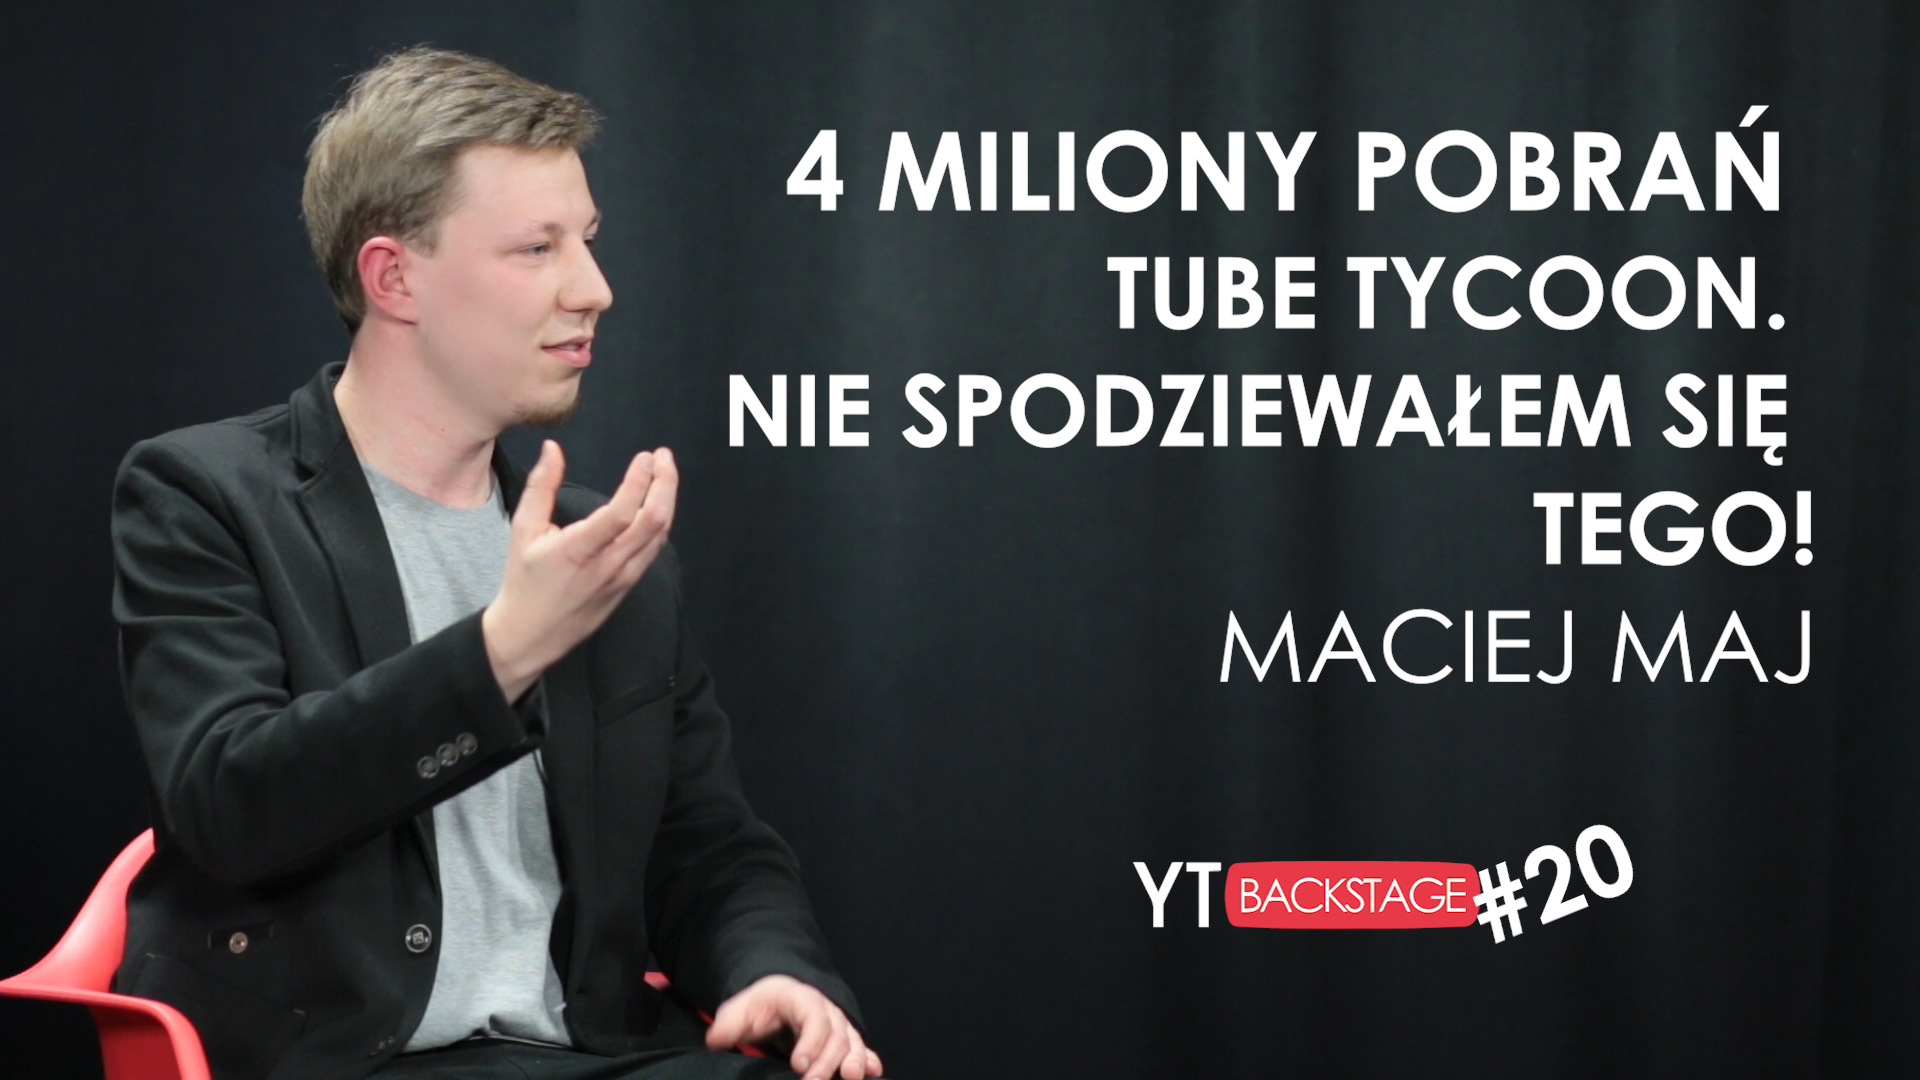 Tube Tycoon Maciej Maj